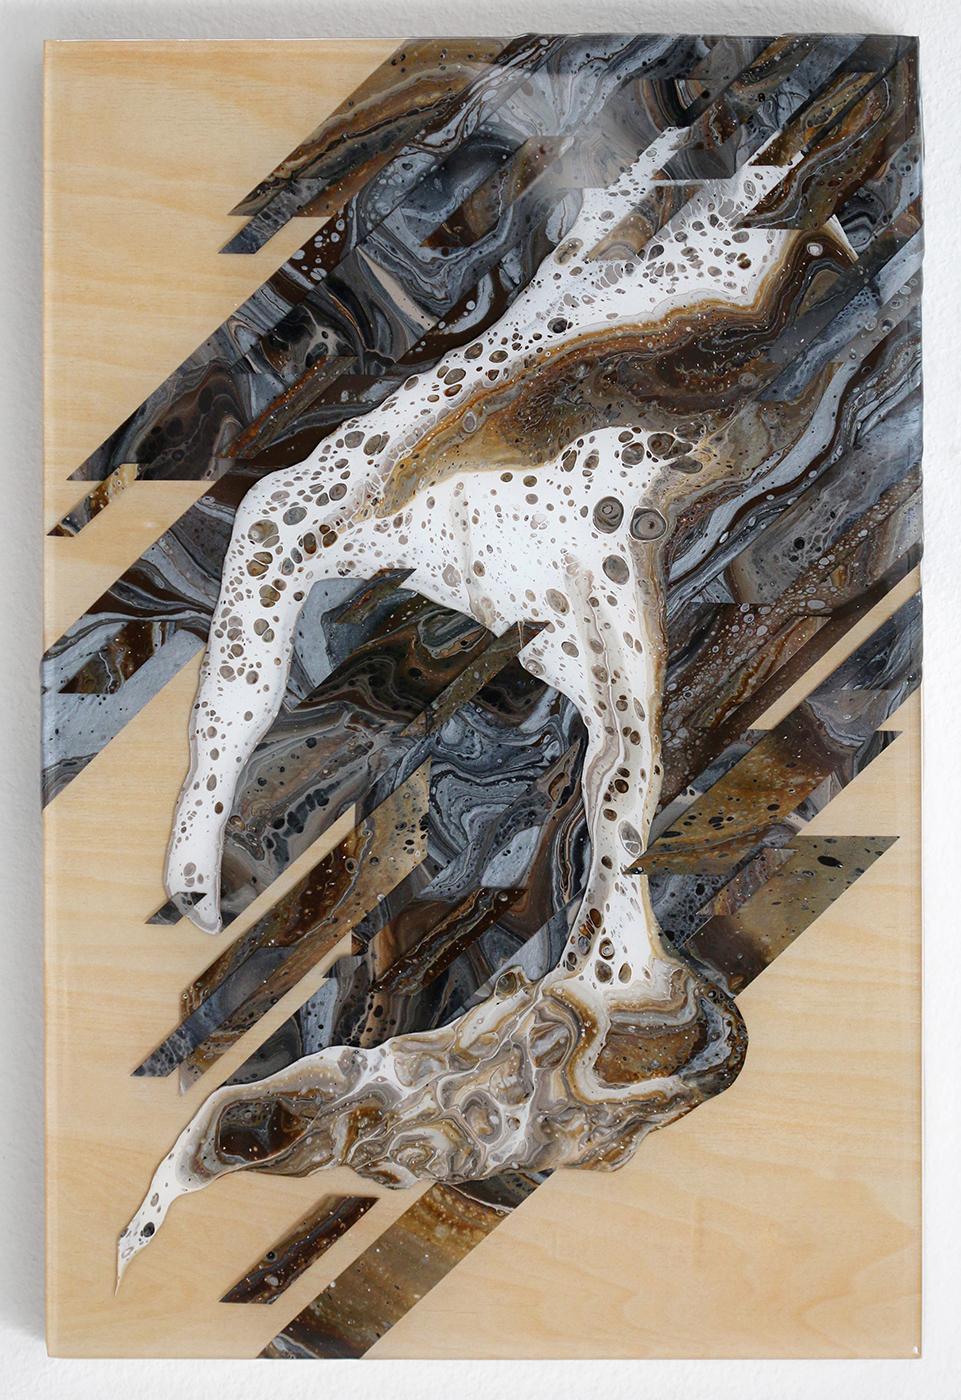 Seasoned Schemes | 12x18x1.5 | acrylic on wood panel with 3x resin finish